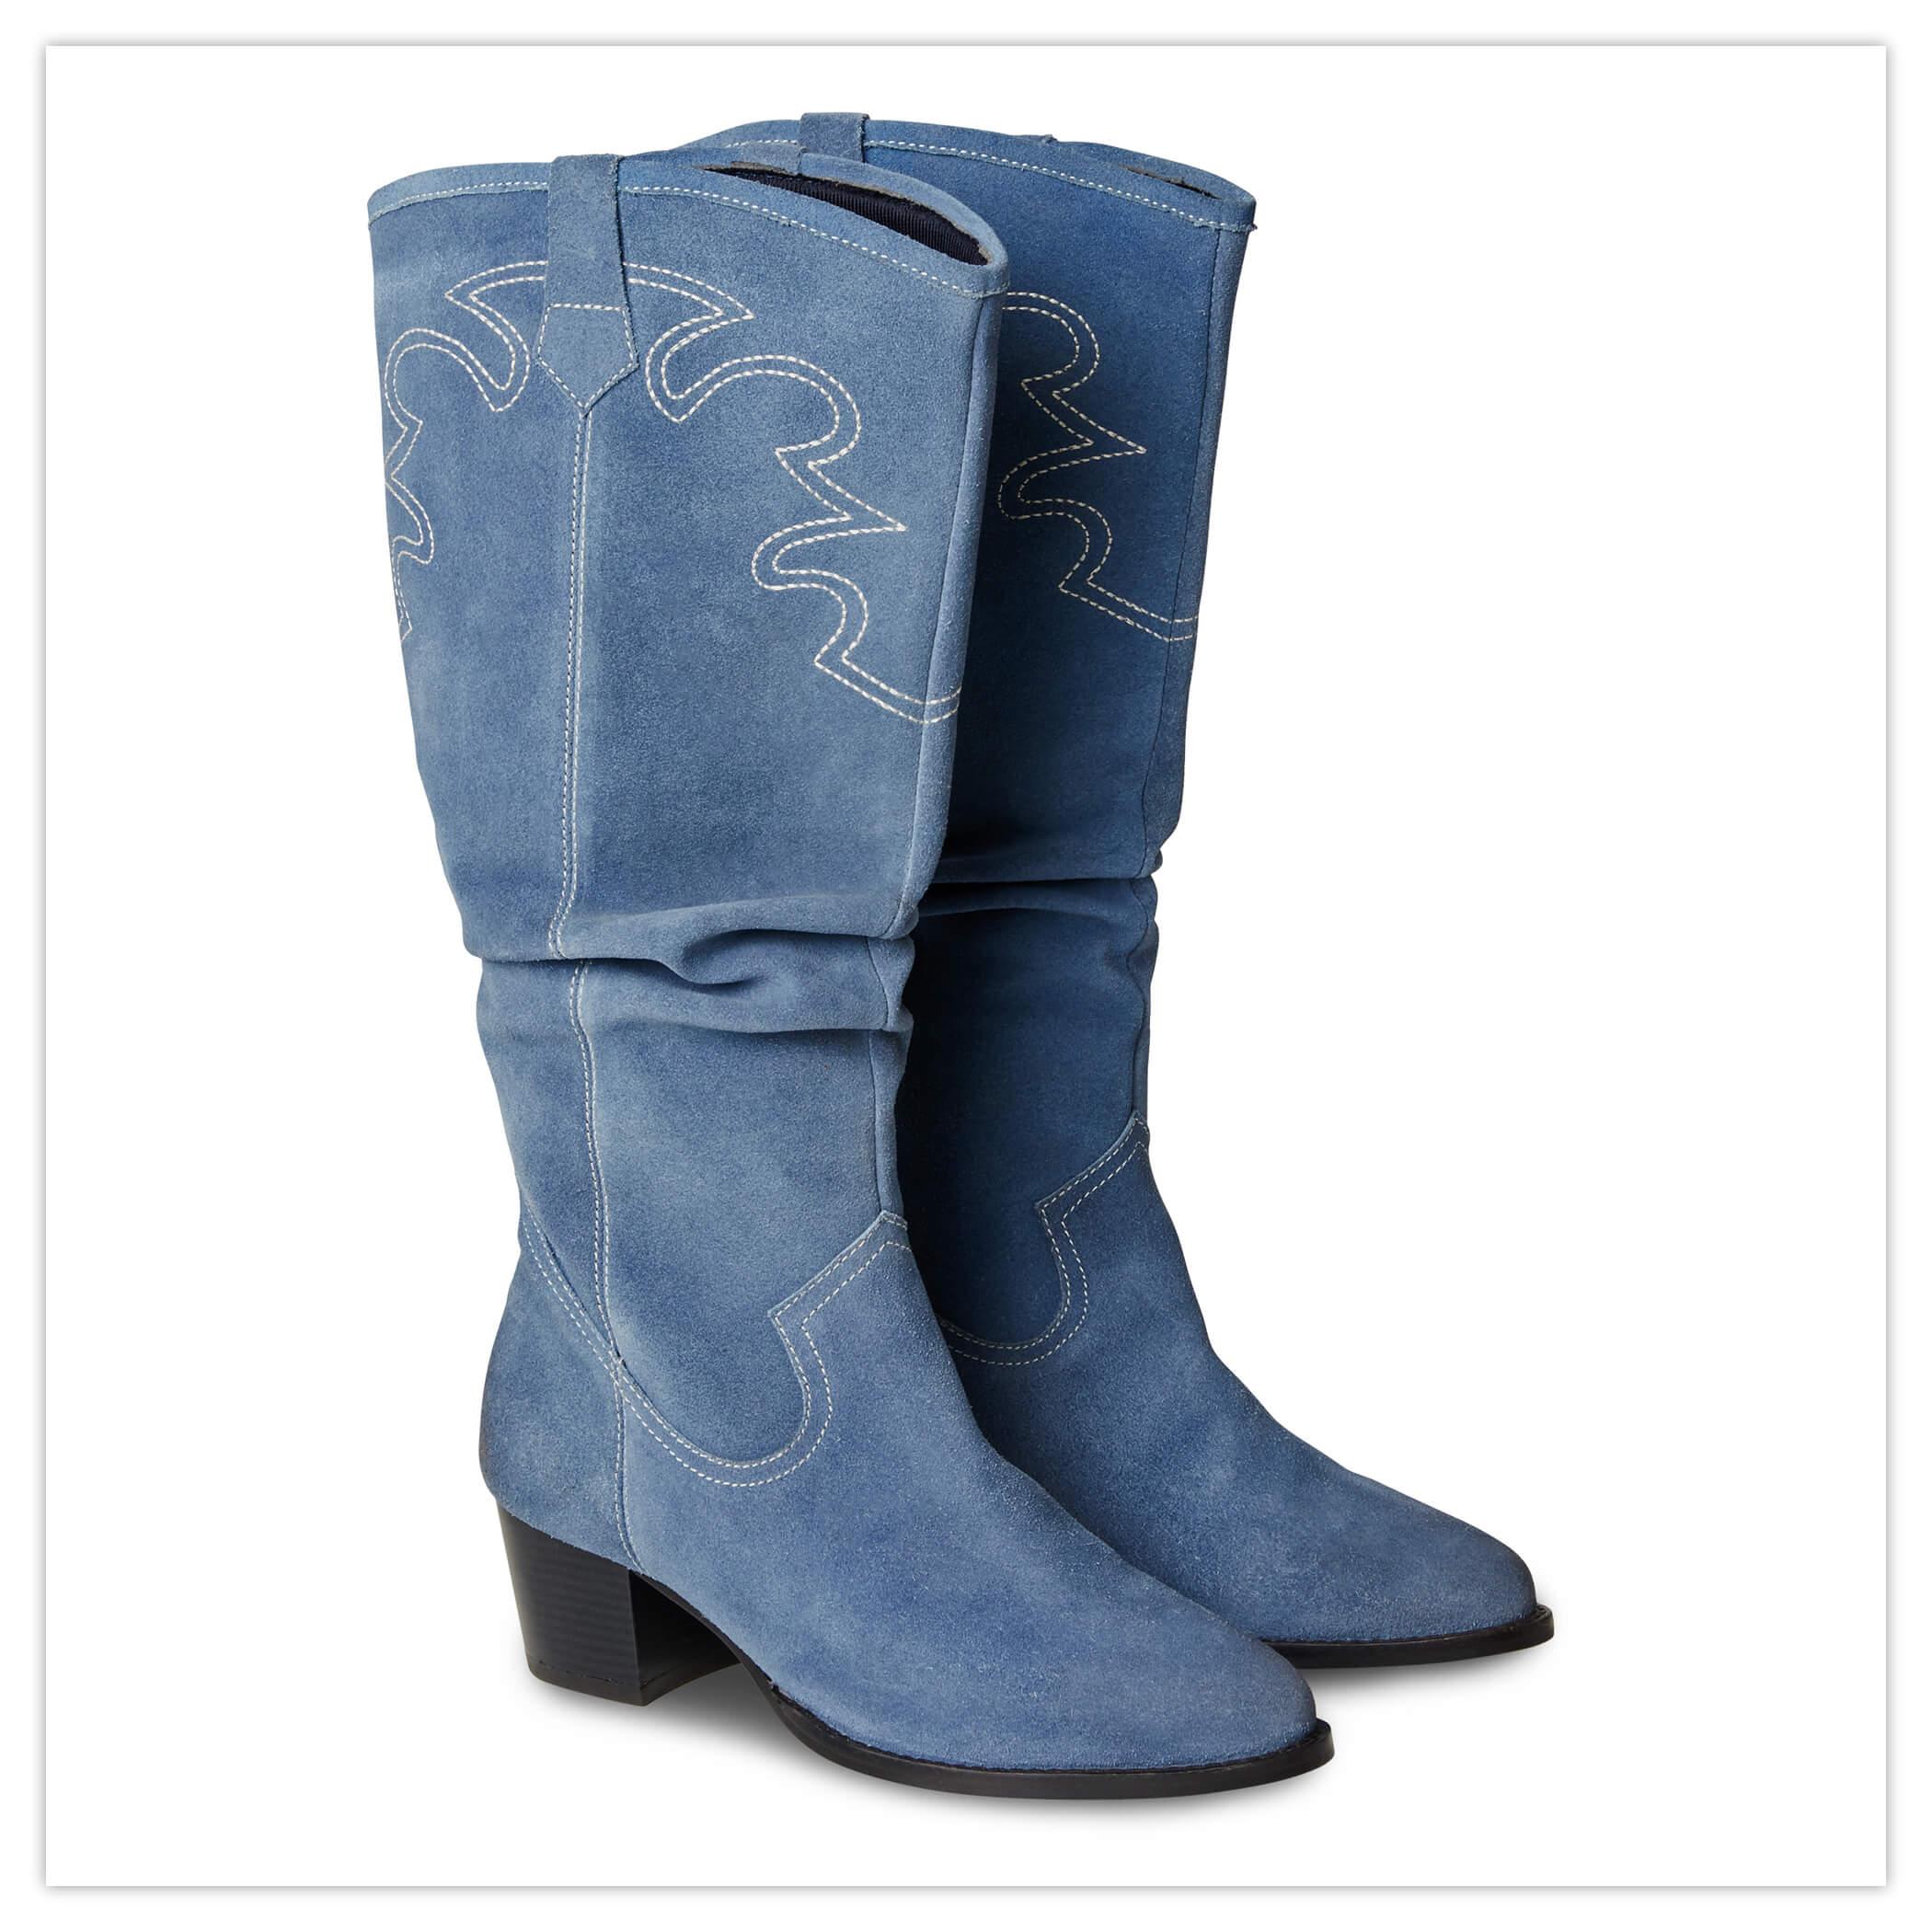 Joe Browns Sundown Suede Slouch Boots